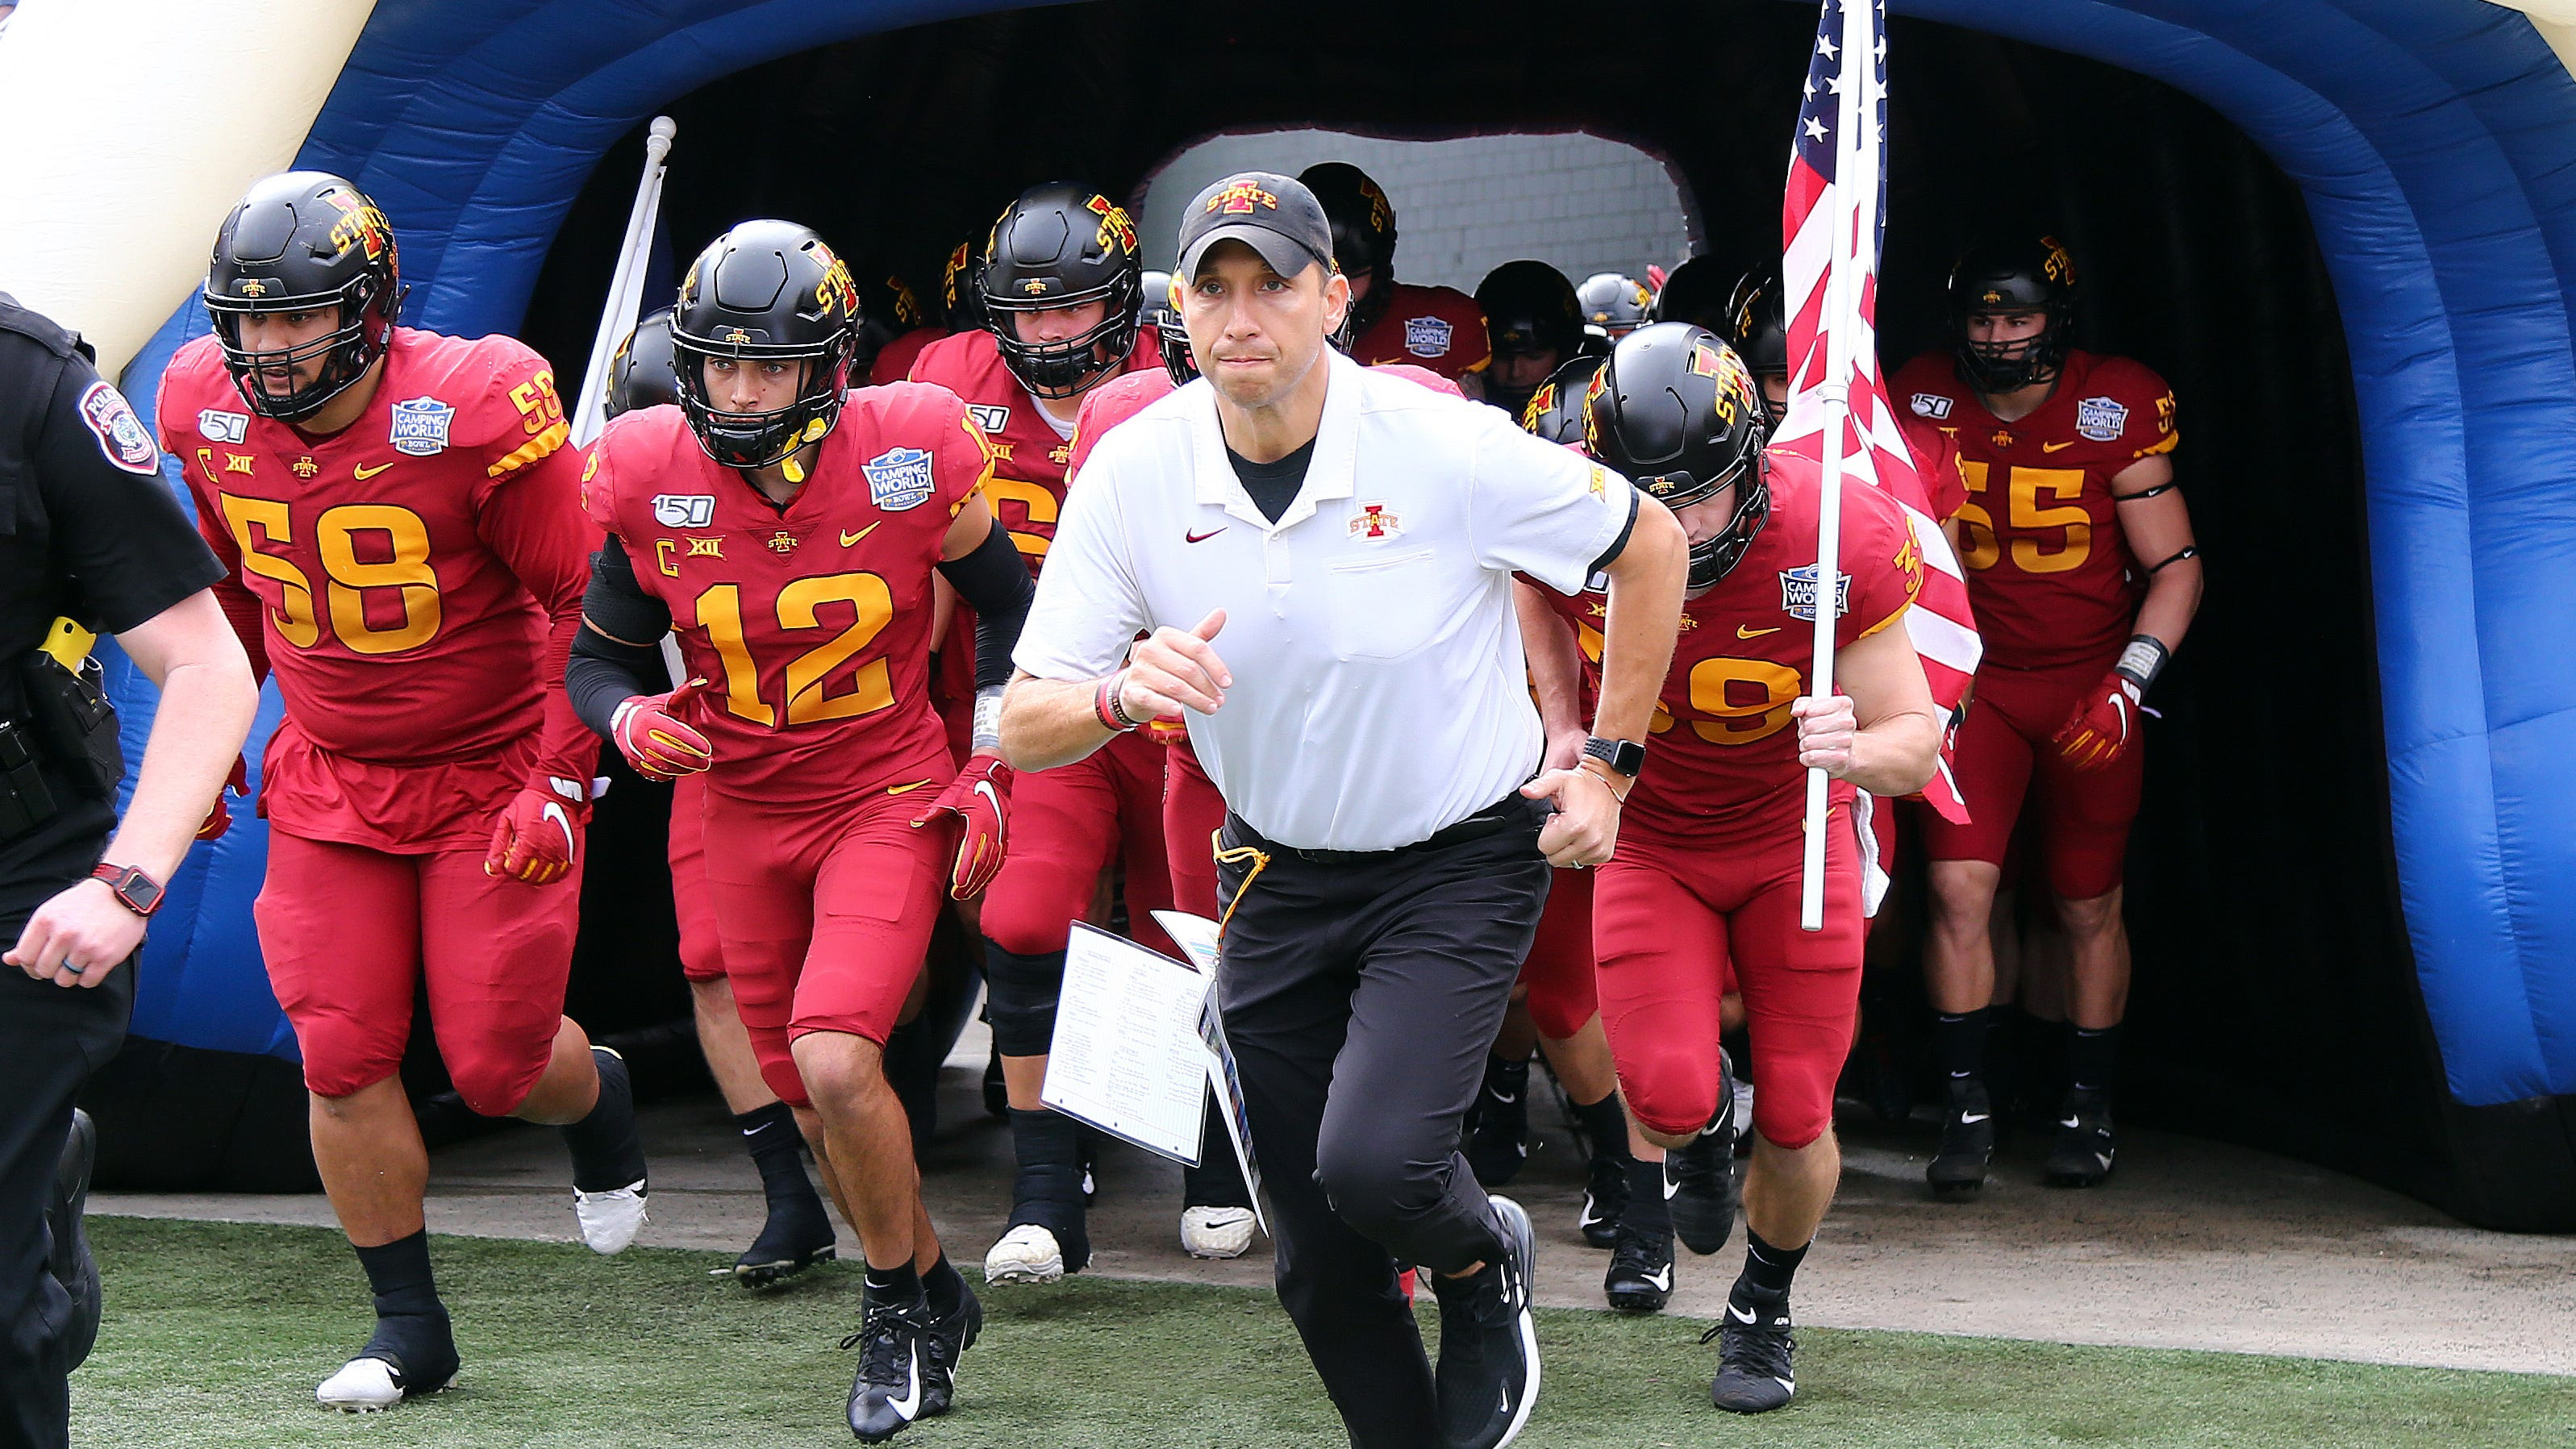 Iowa State football still plans for fans inside Jack Trice Stadium